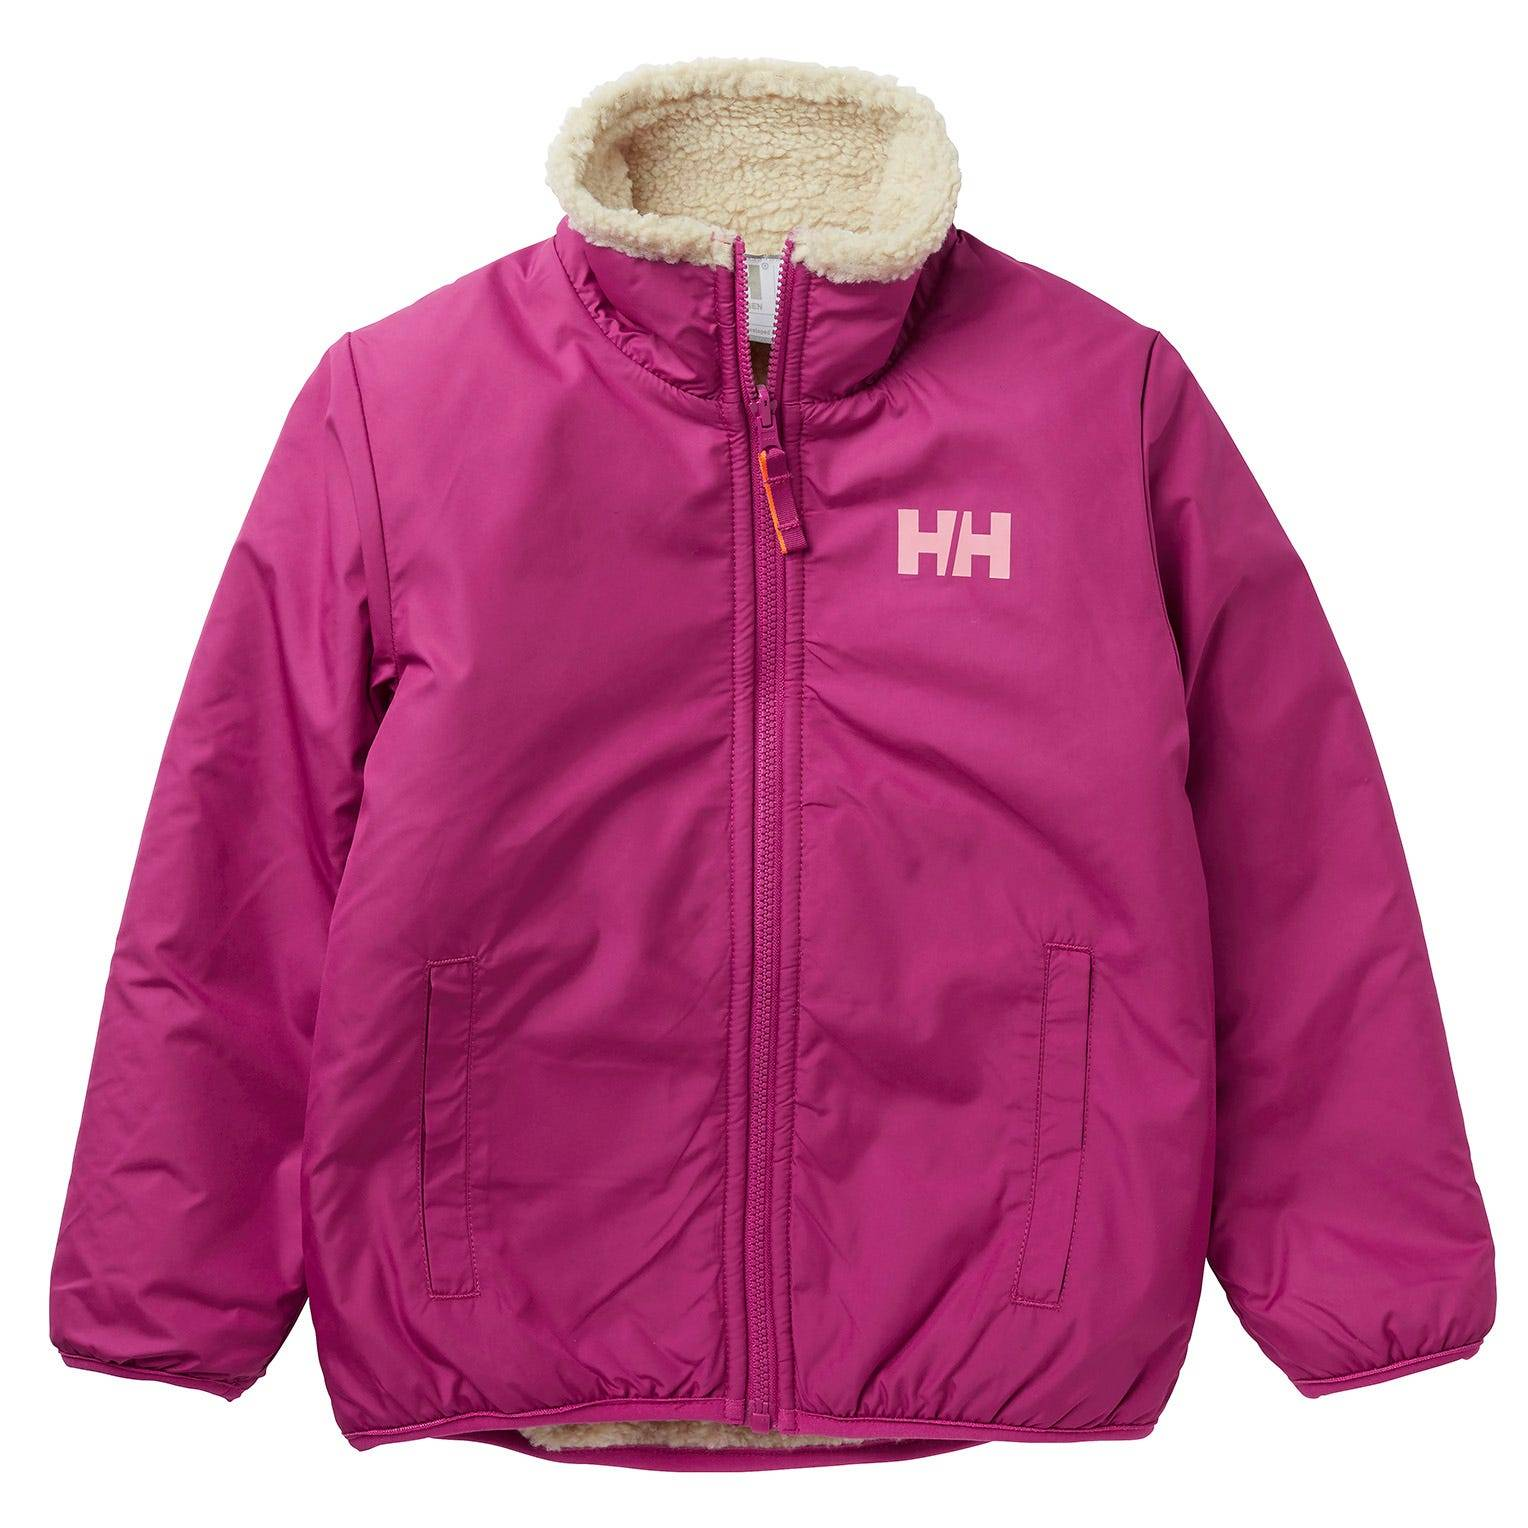 Helly Hansen Kids Reversible Pile Jacket Parka Yellow 104/4